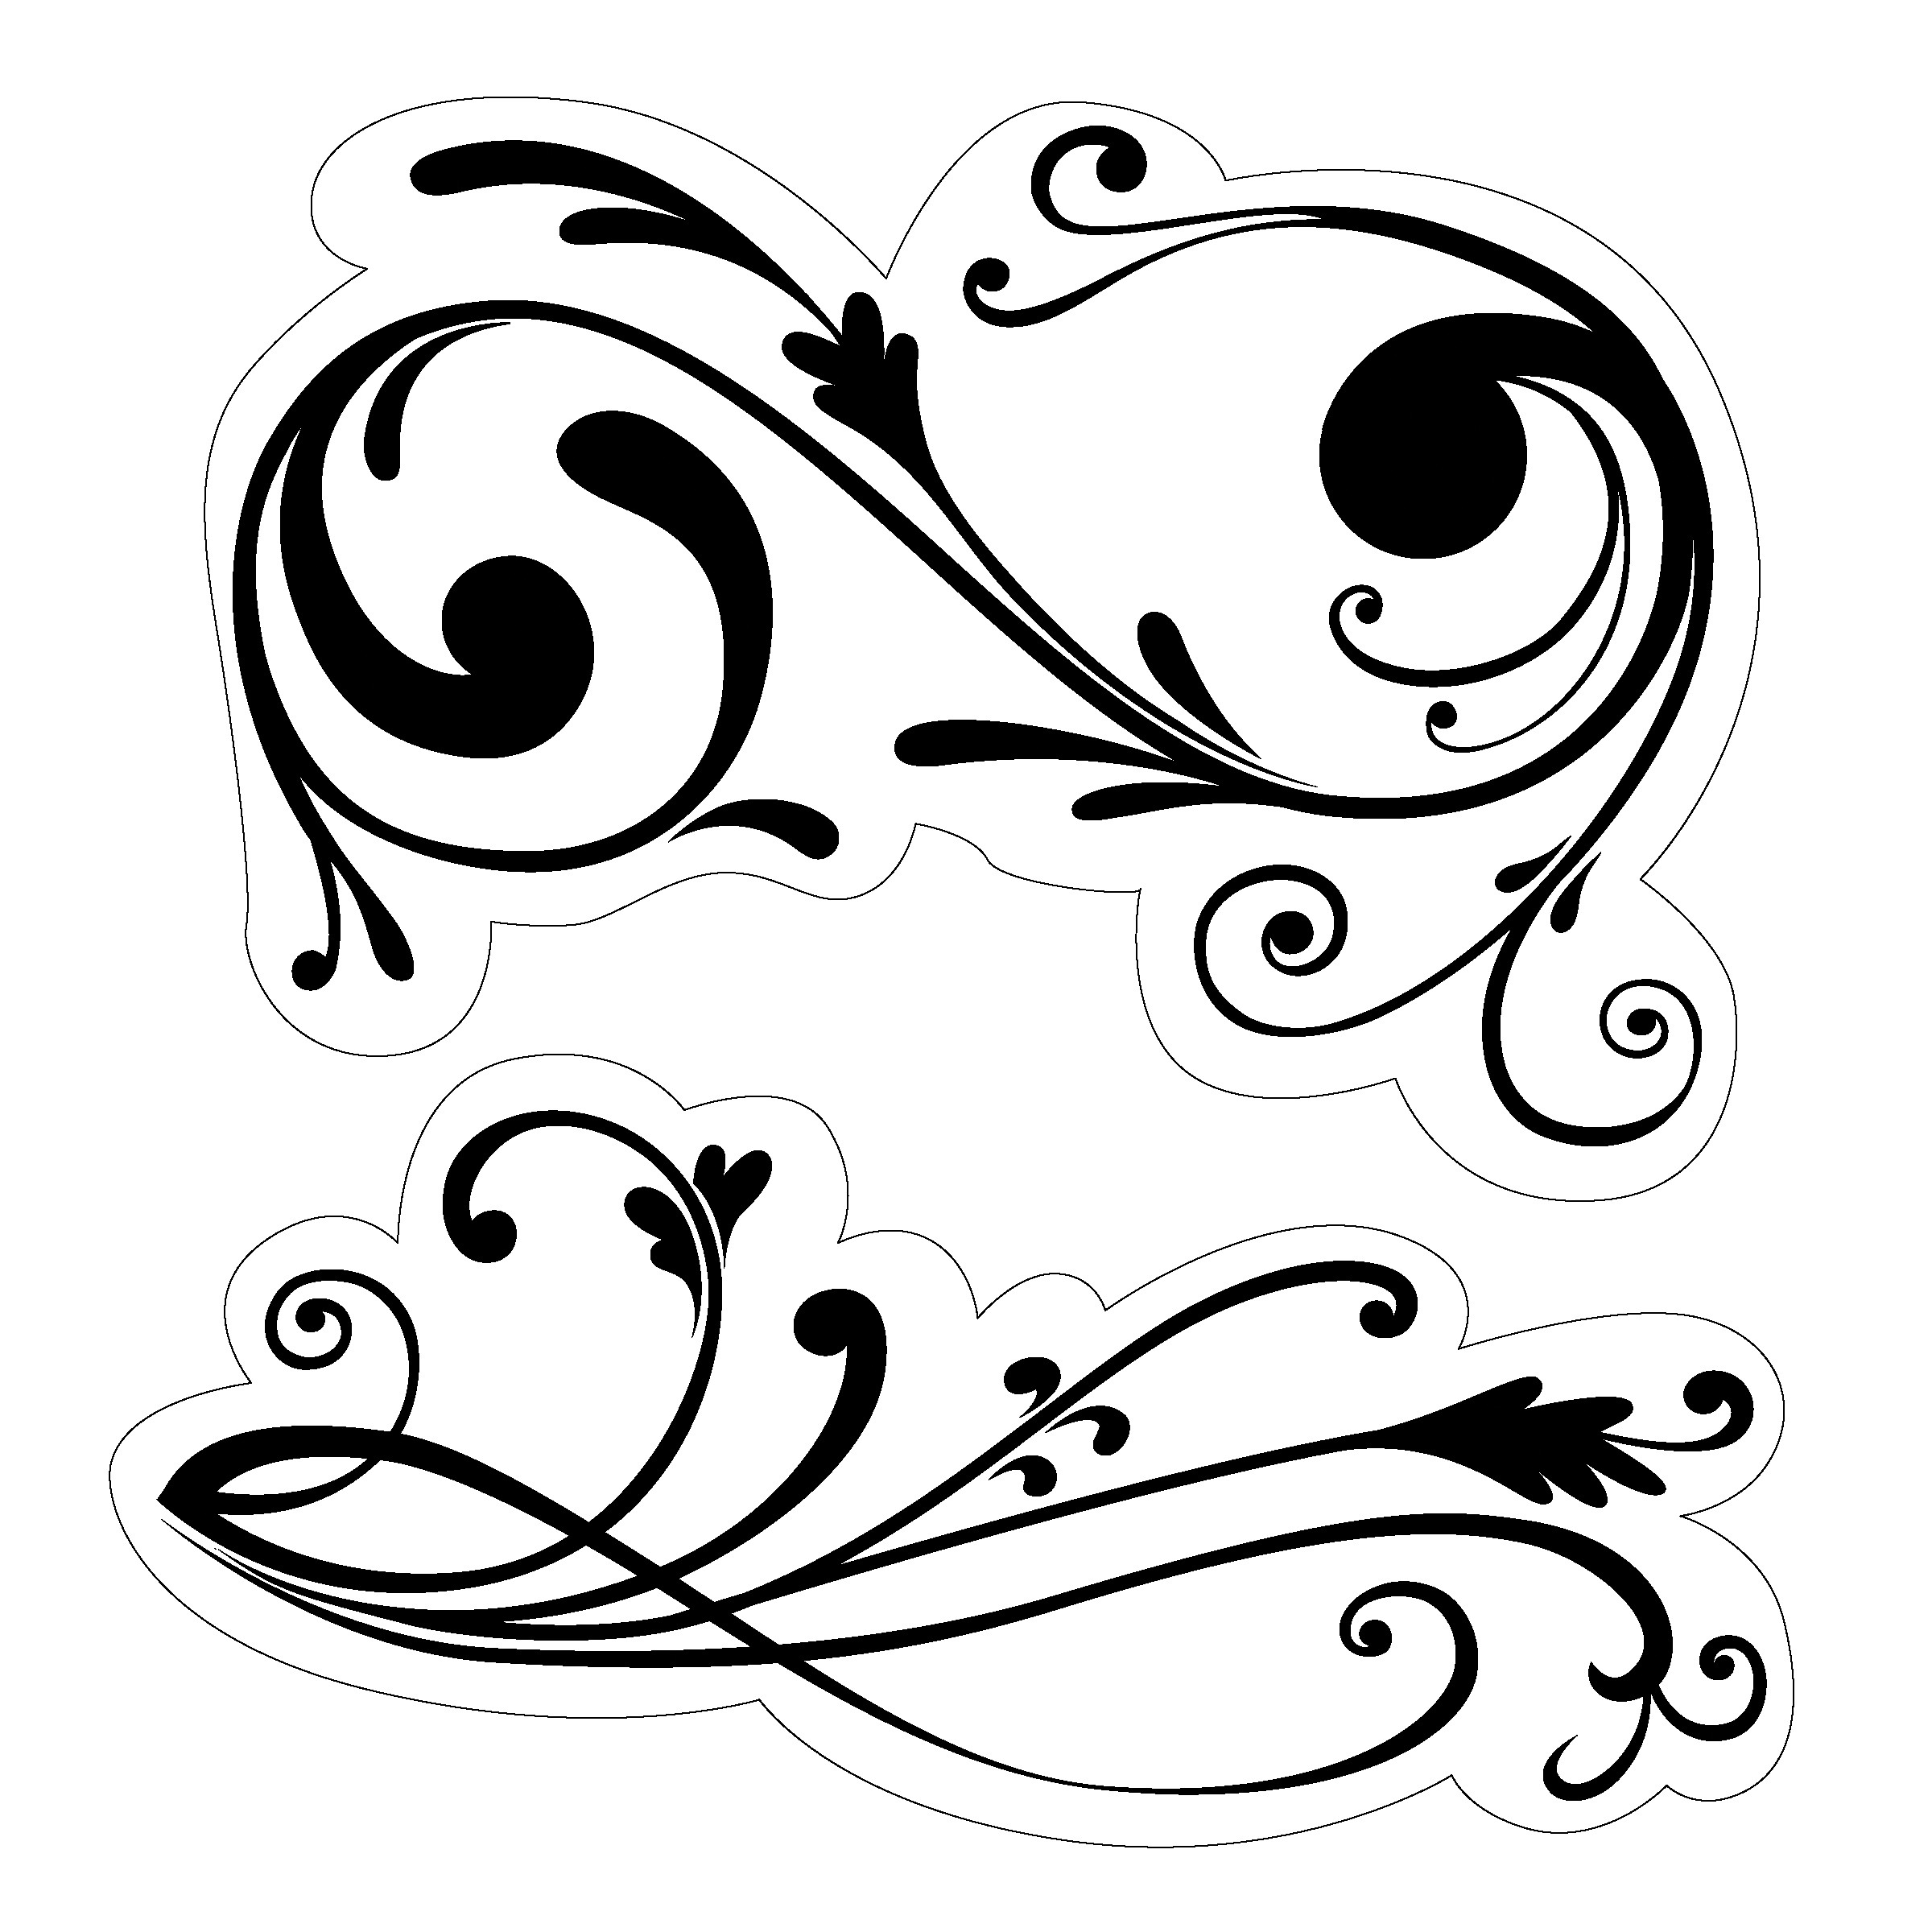 Filigree designs clipart vector royalty free Free Filigree Cliparts, Download Free Clip Art, Free Clip Art on ... vector royalty free